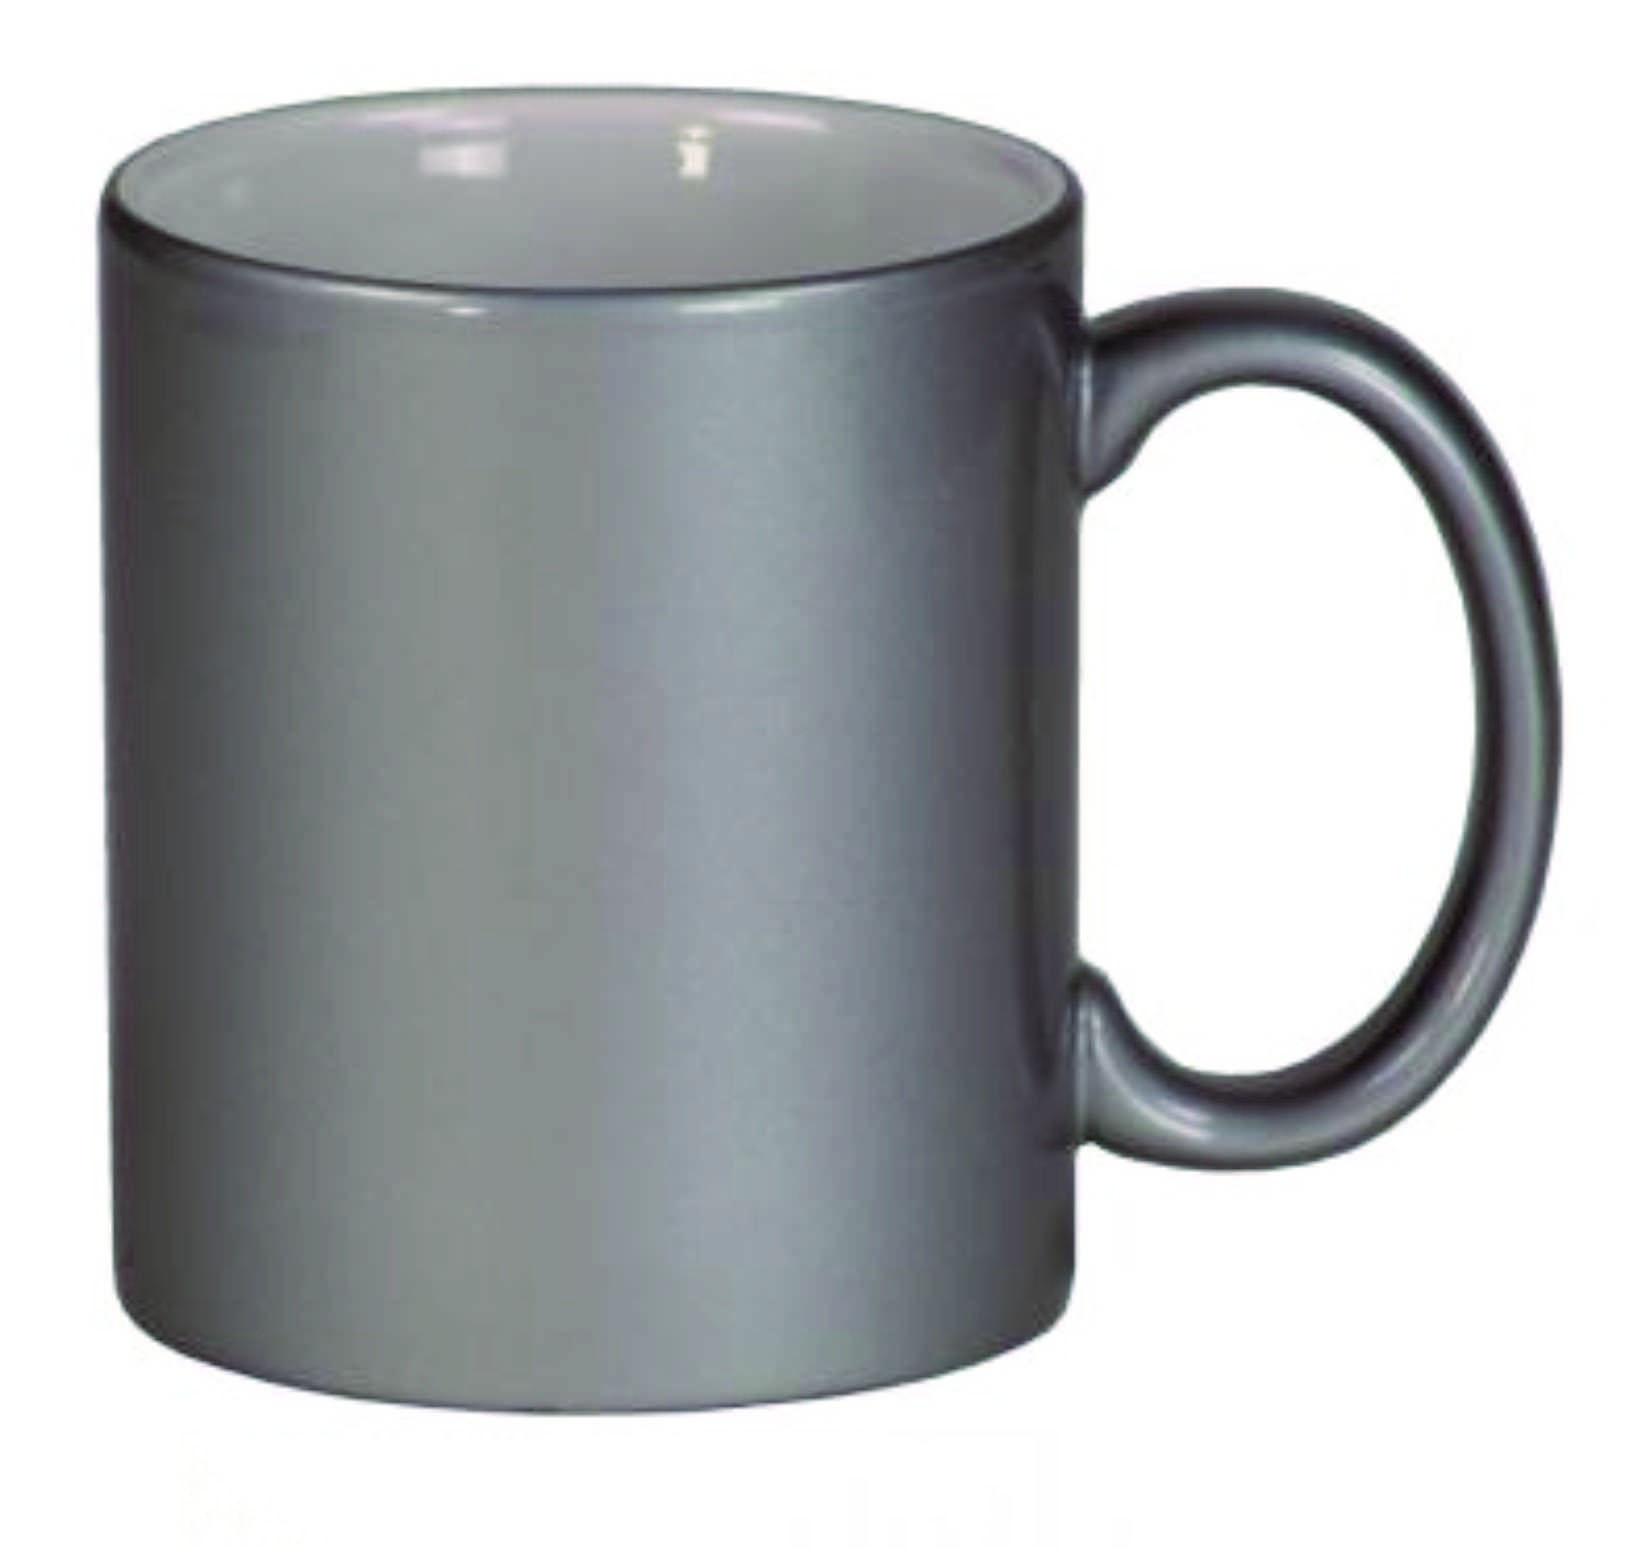 Mug clipart grey coffee. X free clip art